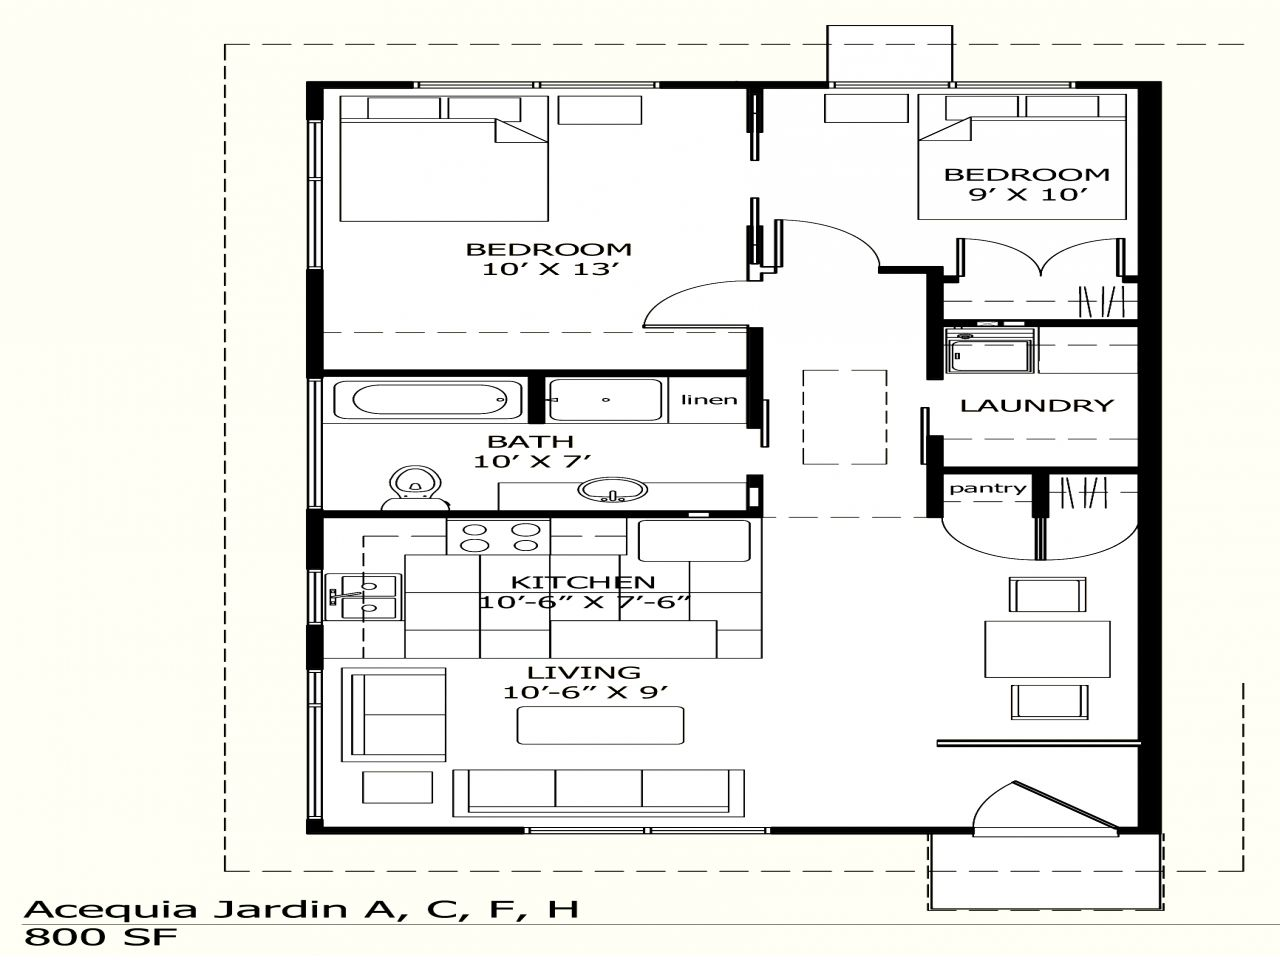 House Plans Under 800 Sq Ft Escortsea Square Feet Kerala Modern